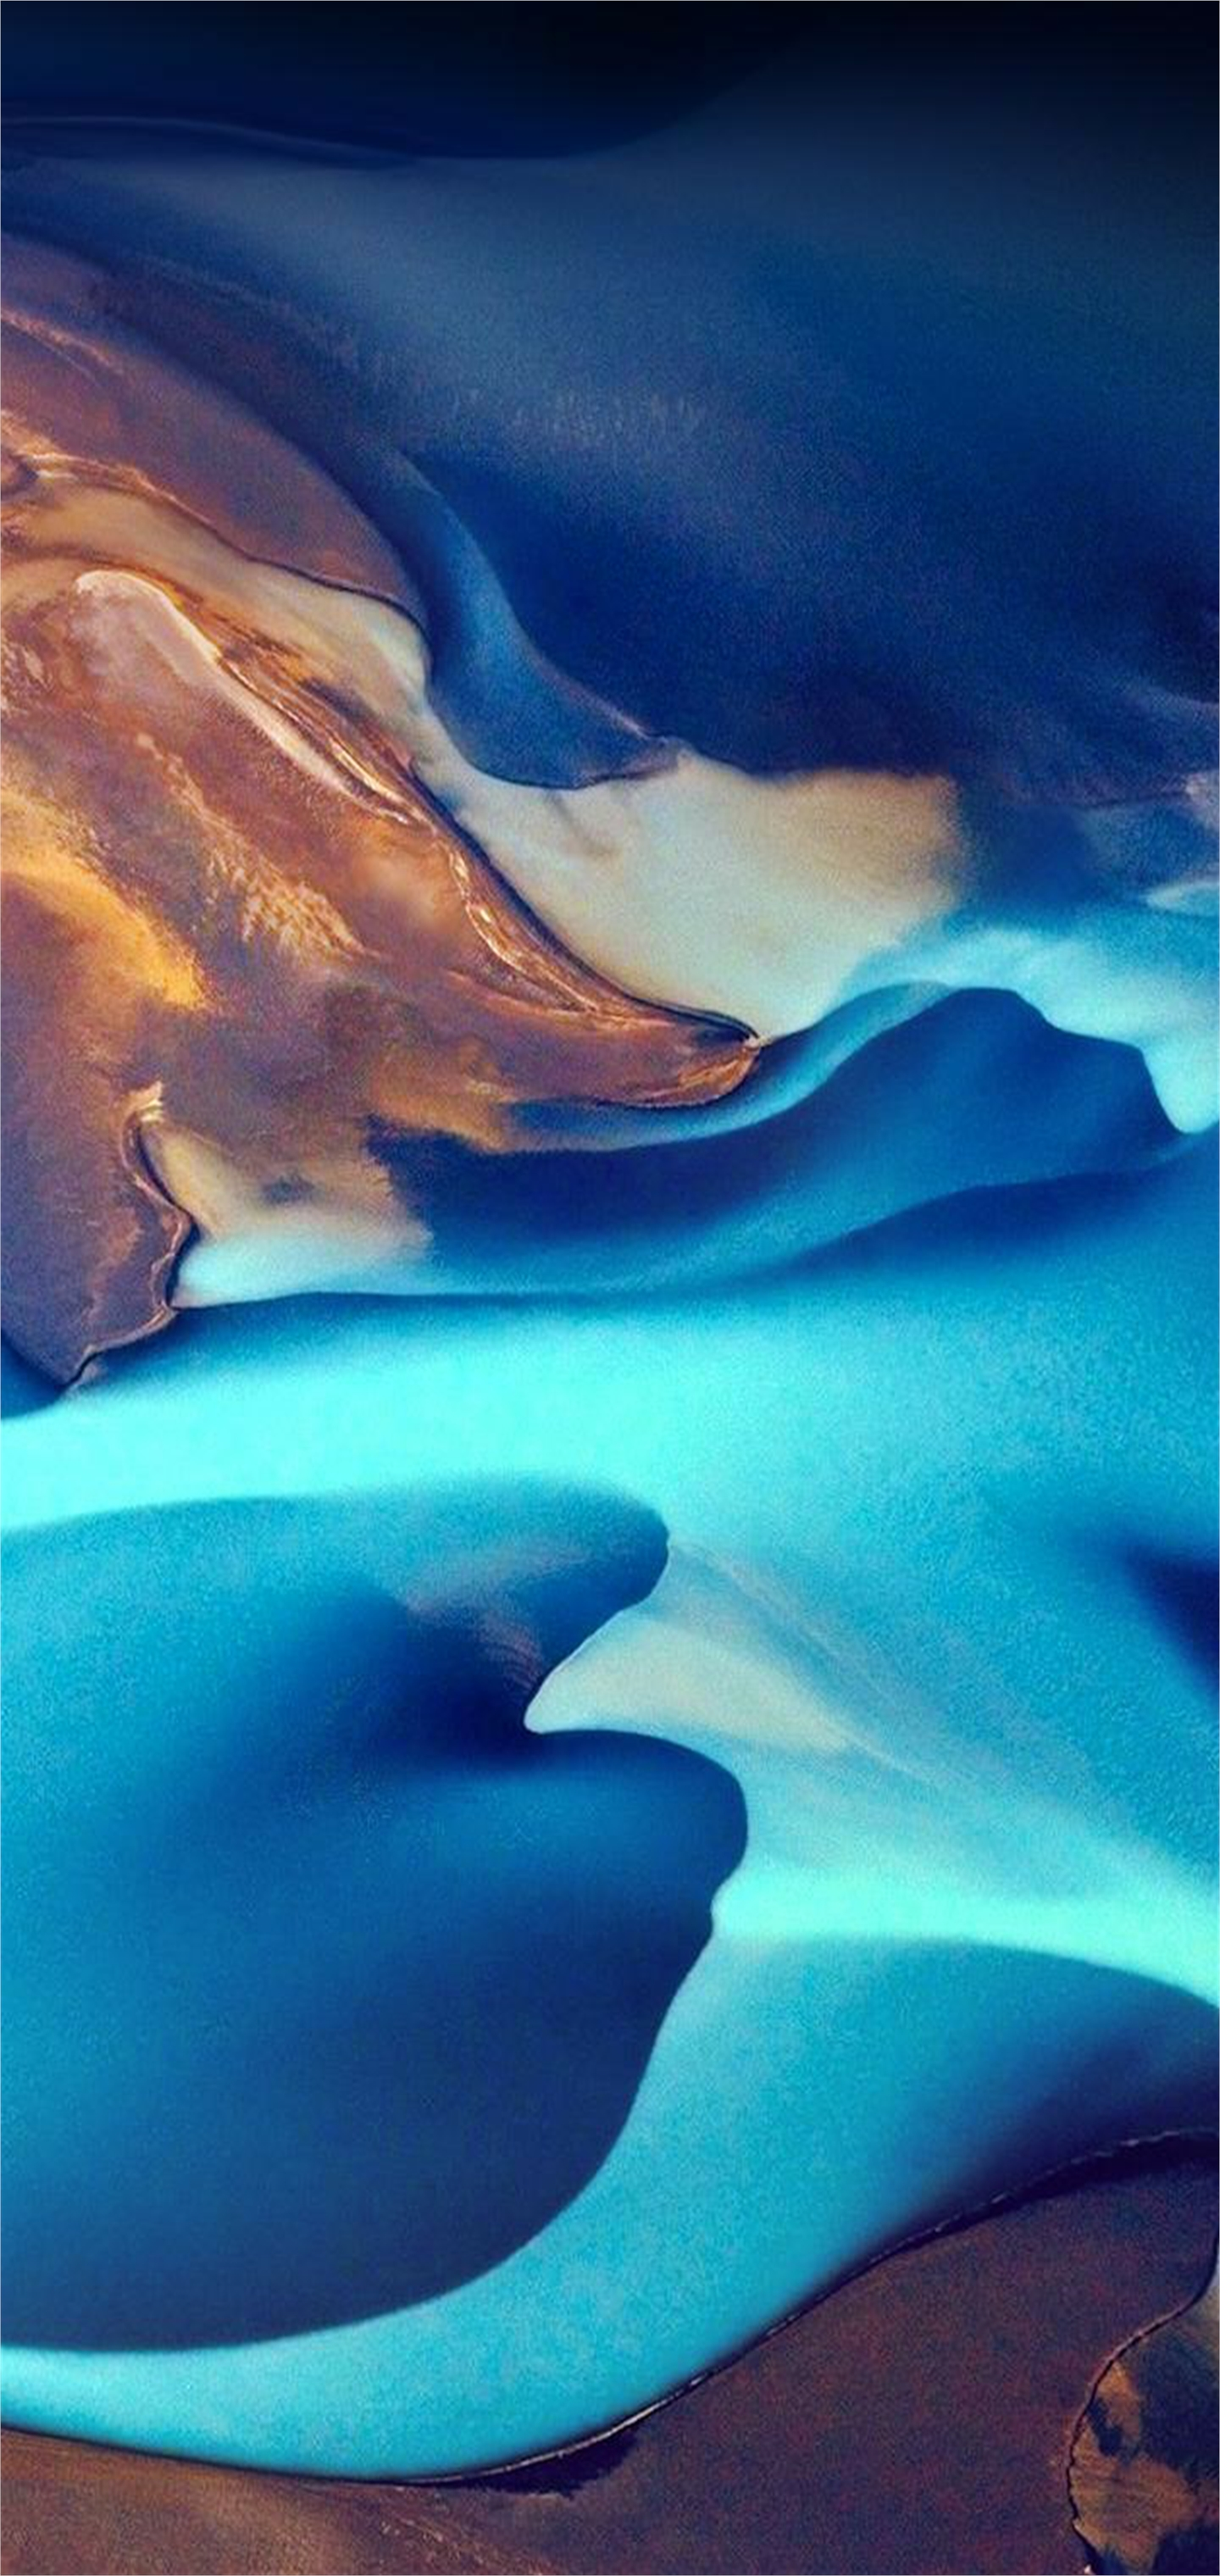 Samsung Galaxy A10 Wallpapers Wallpaper Cave